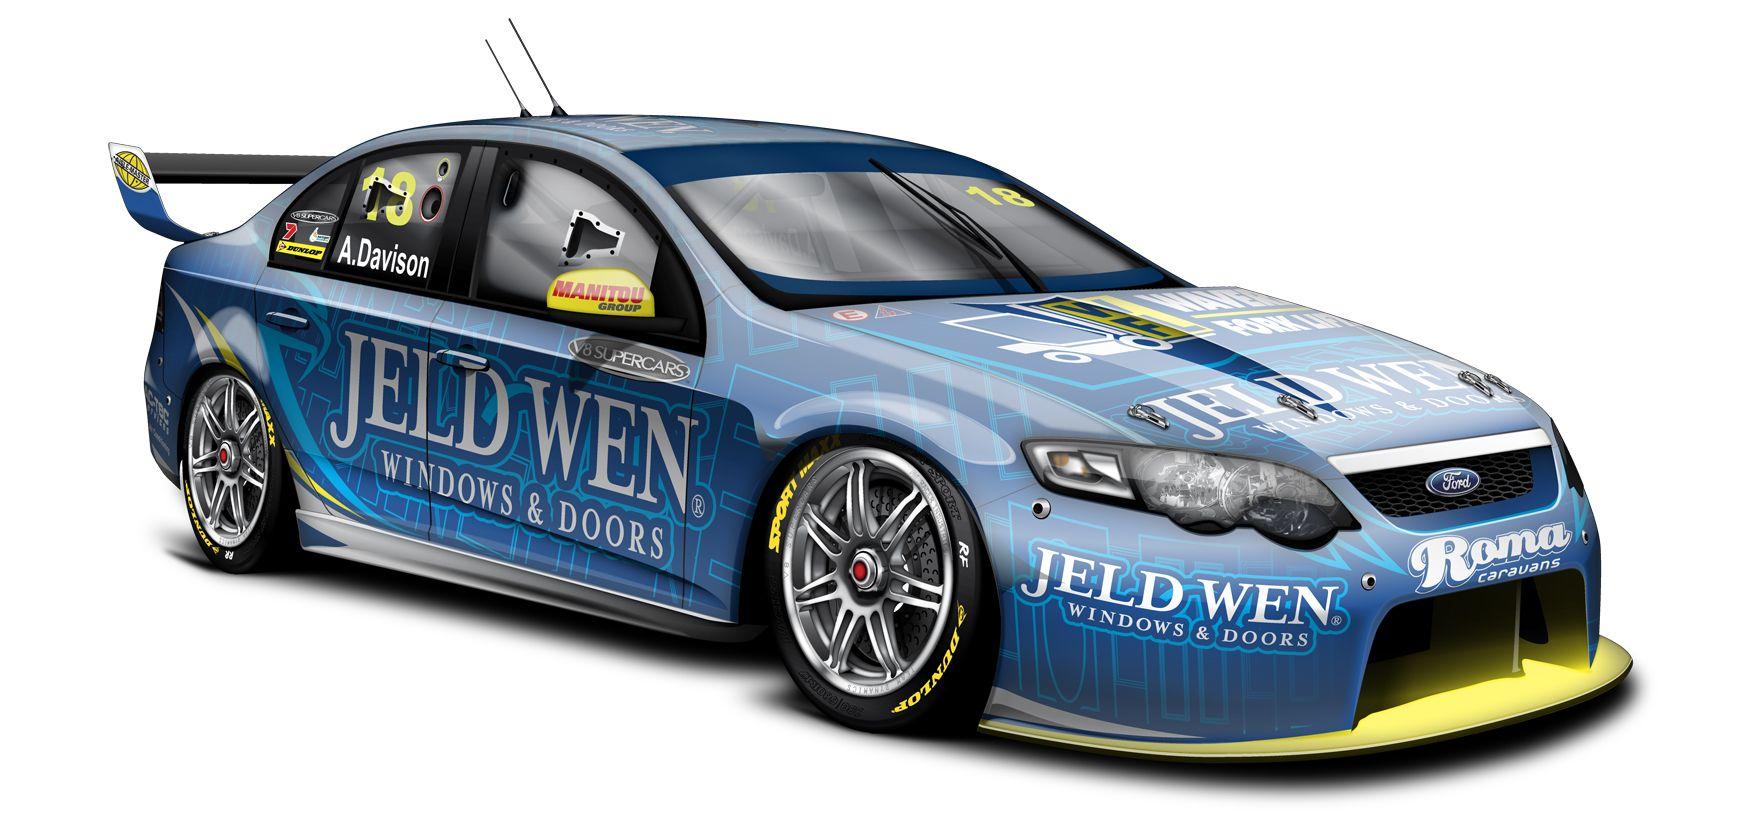 V8 Supercars The Official Website Touring Car Racing Super Cars V8 Supercars Australia